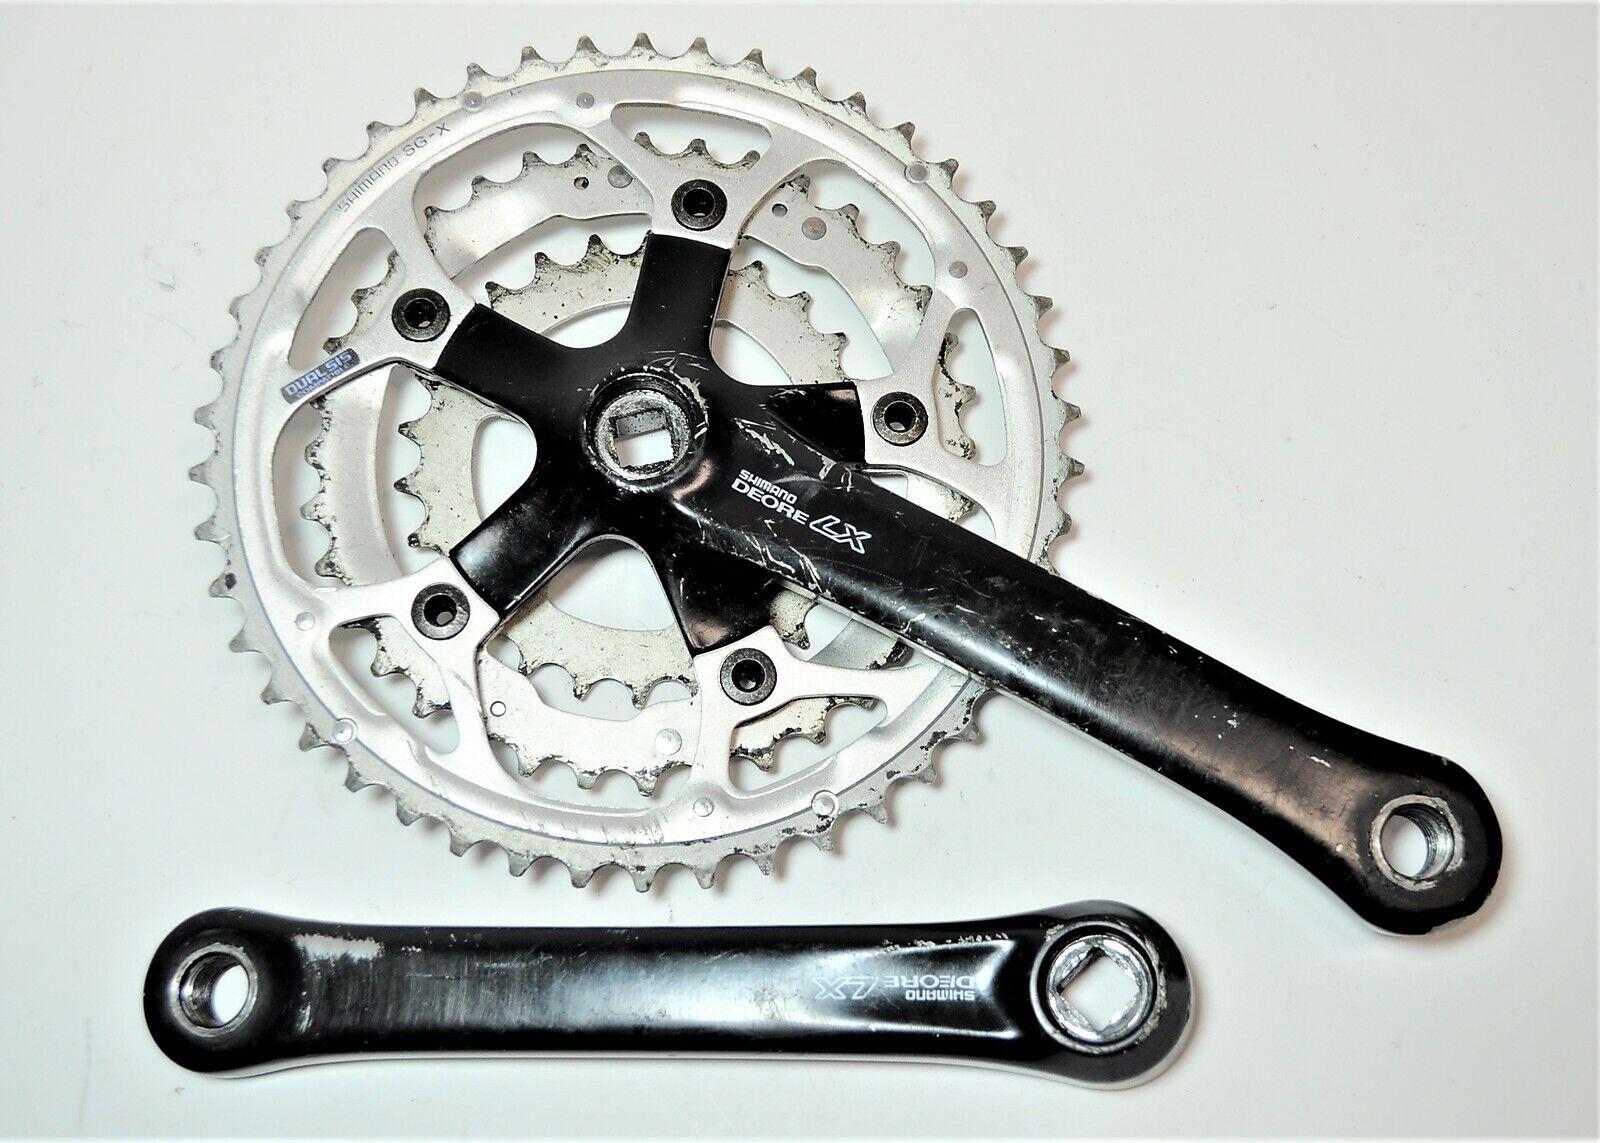 VINTAGE SHIMANO DEORE LX DUAL SIS BICYCLE 175 MM SG-X 46 36 26 CRANKSET FC-M560